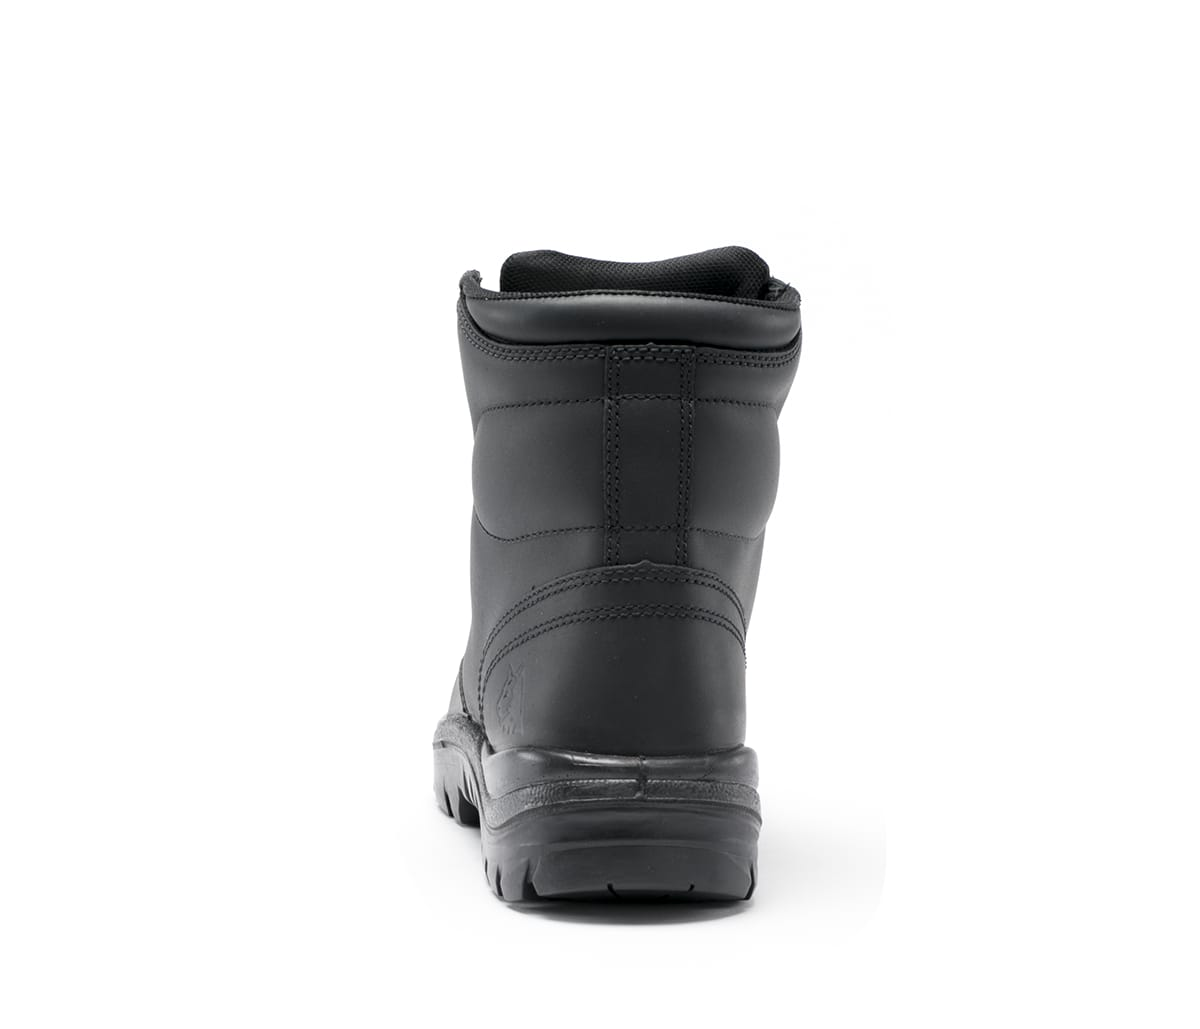 Argyle: Nitrile/Bump Cap - Black